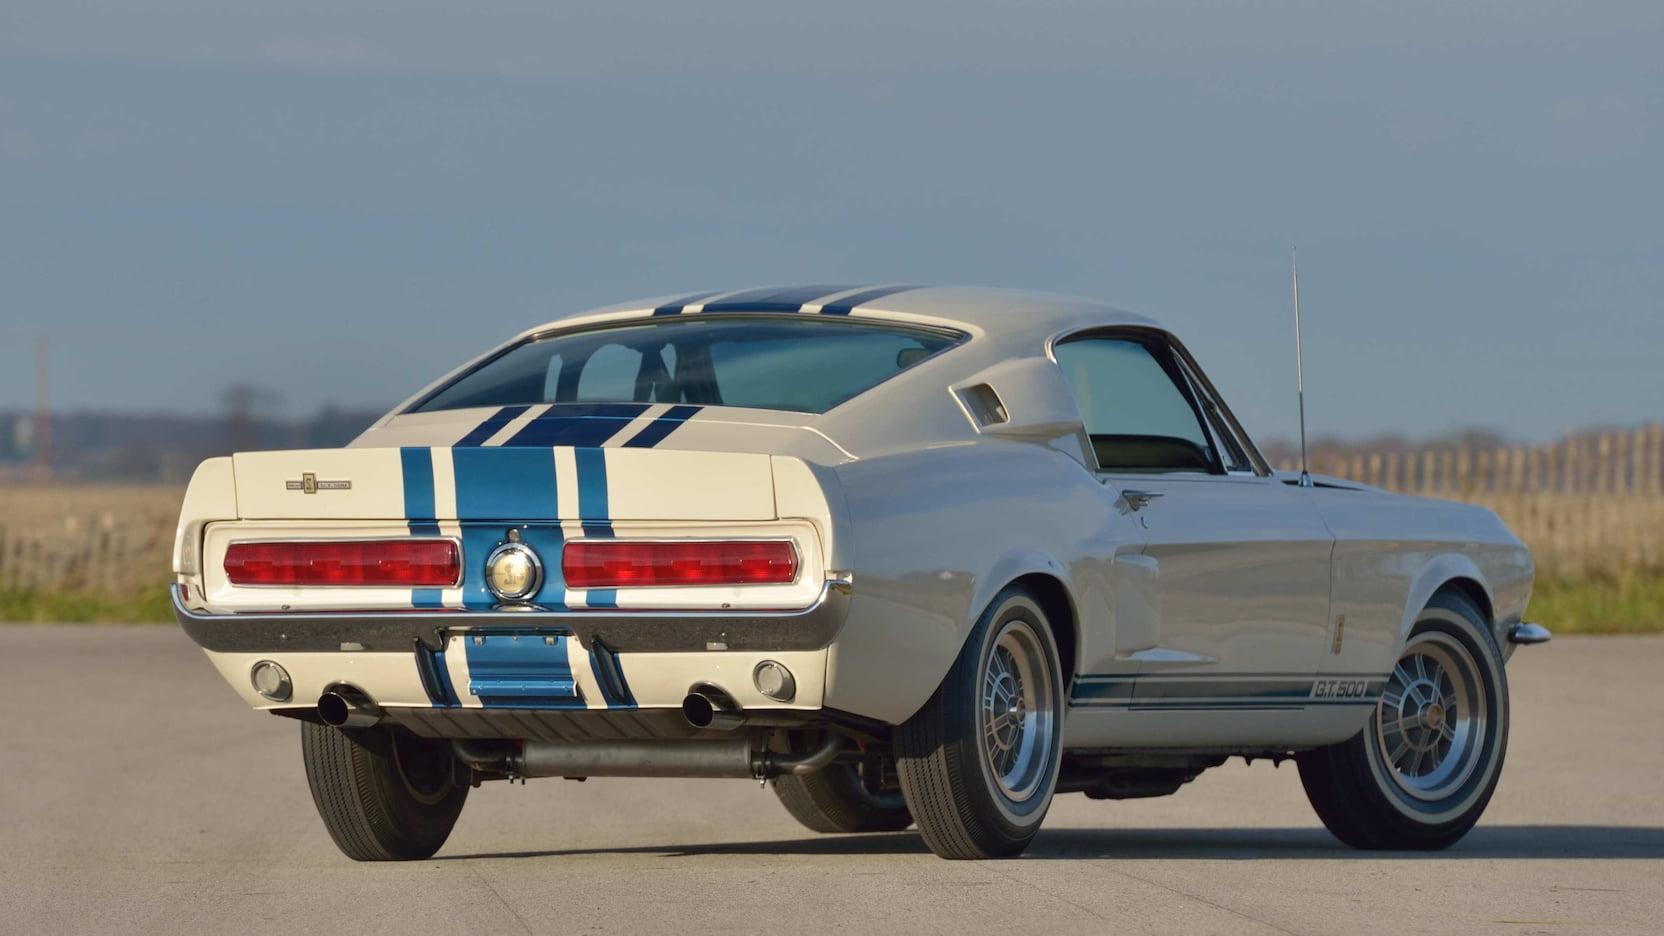 1967 Shelby GT500 Super Snake rear 3/4